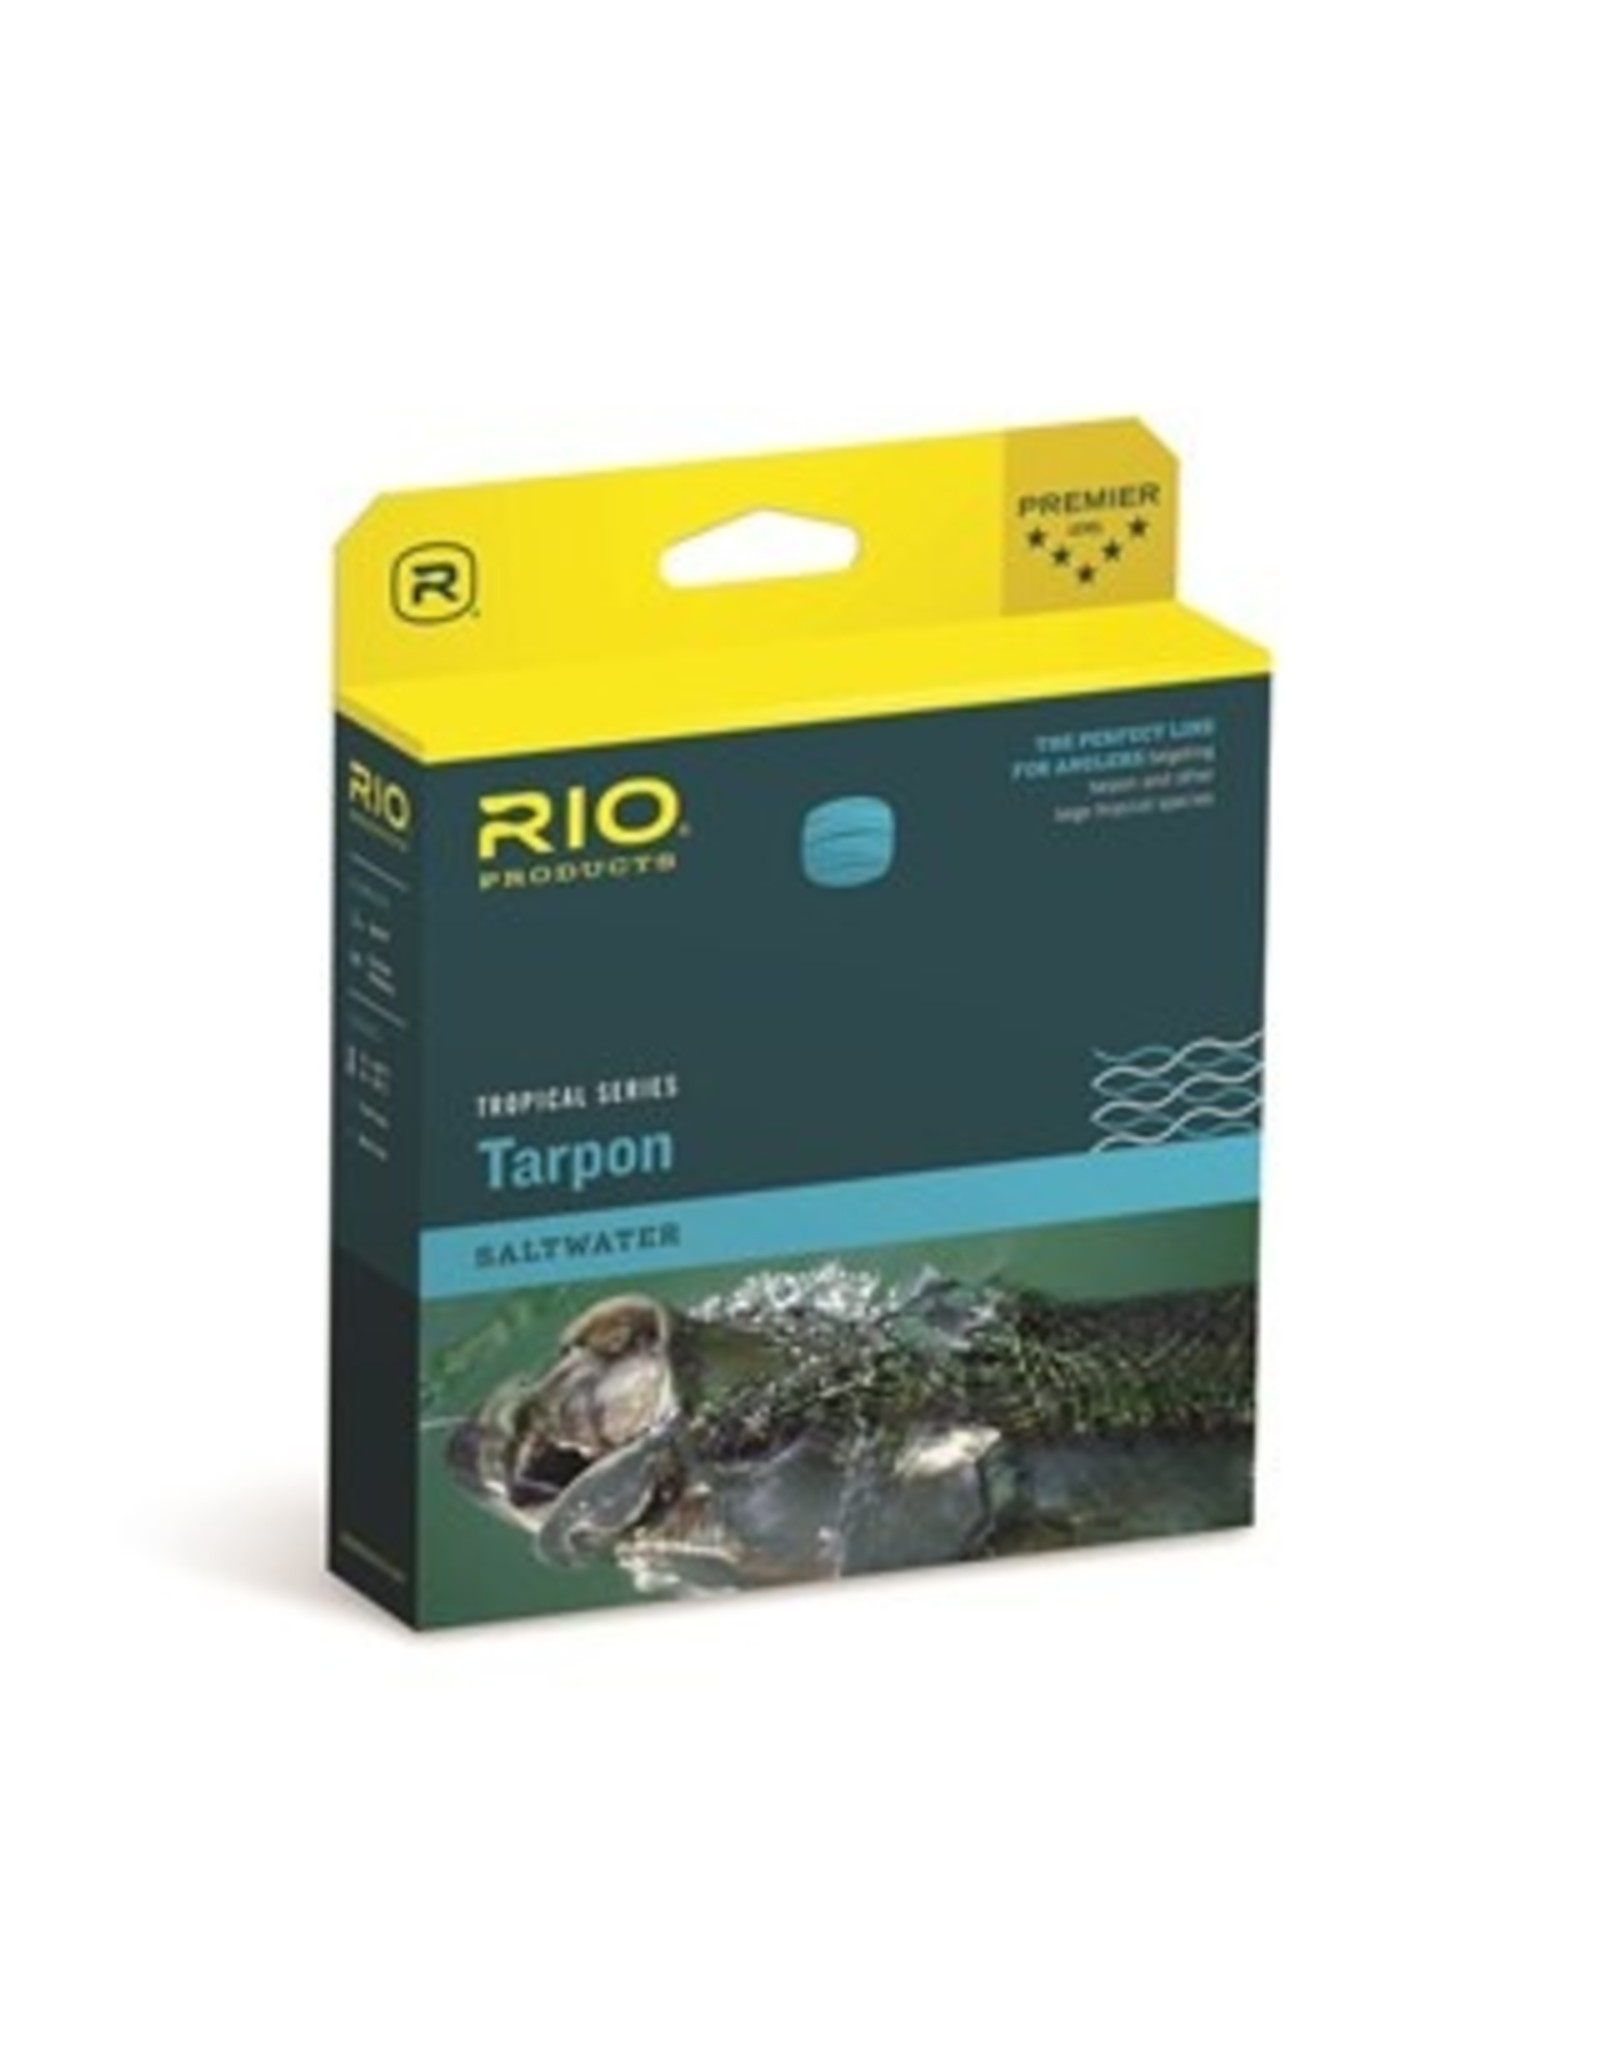 Rio Products Rio - Tarpon Fly Line